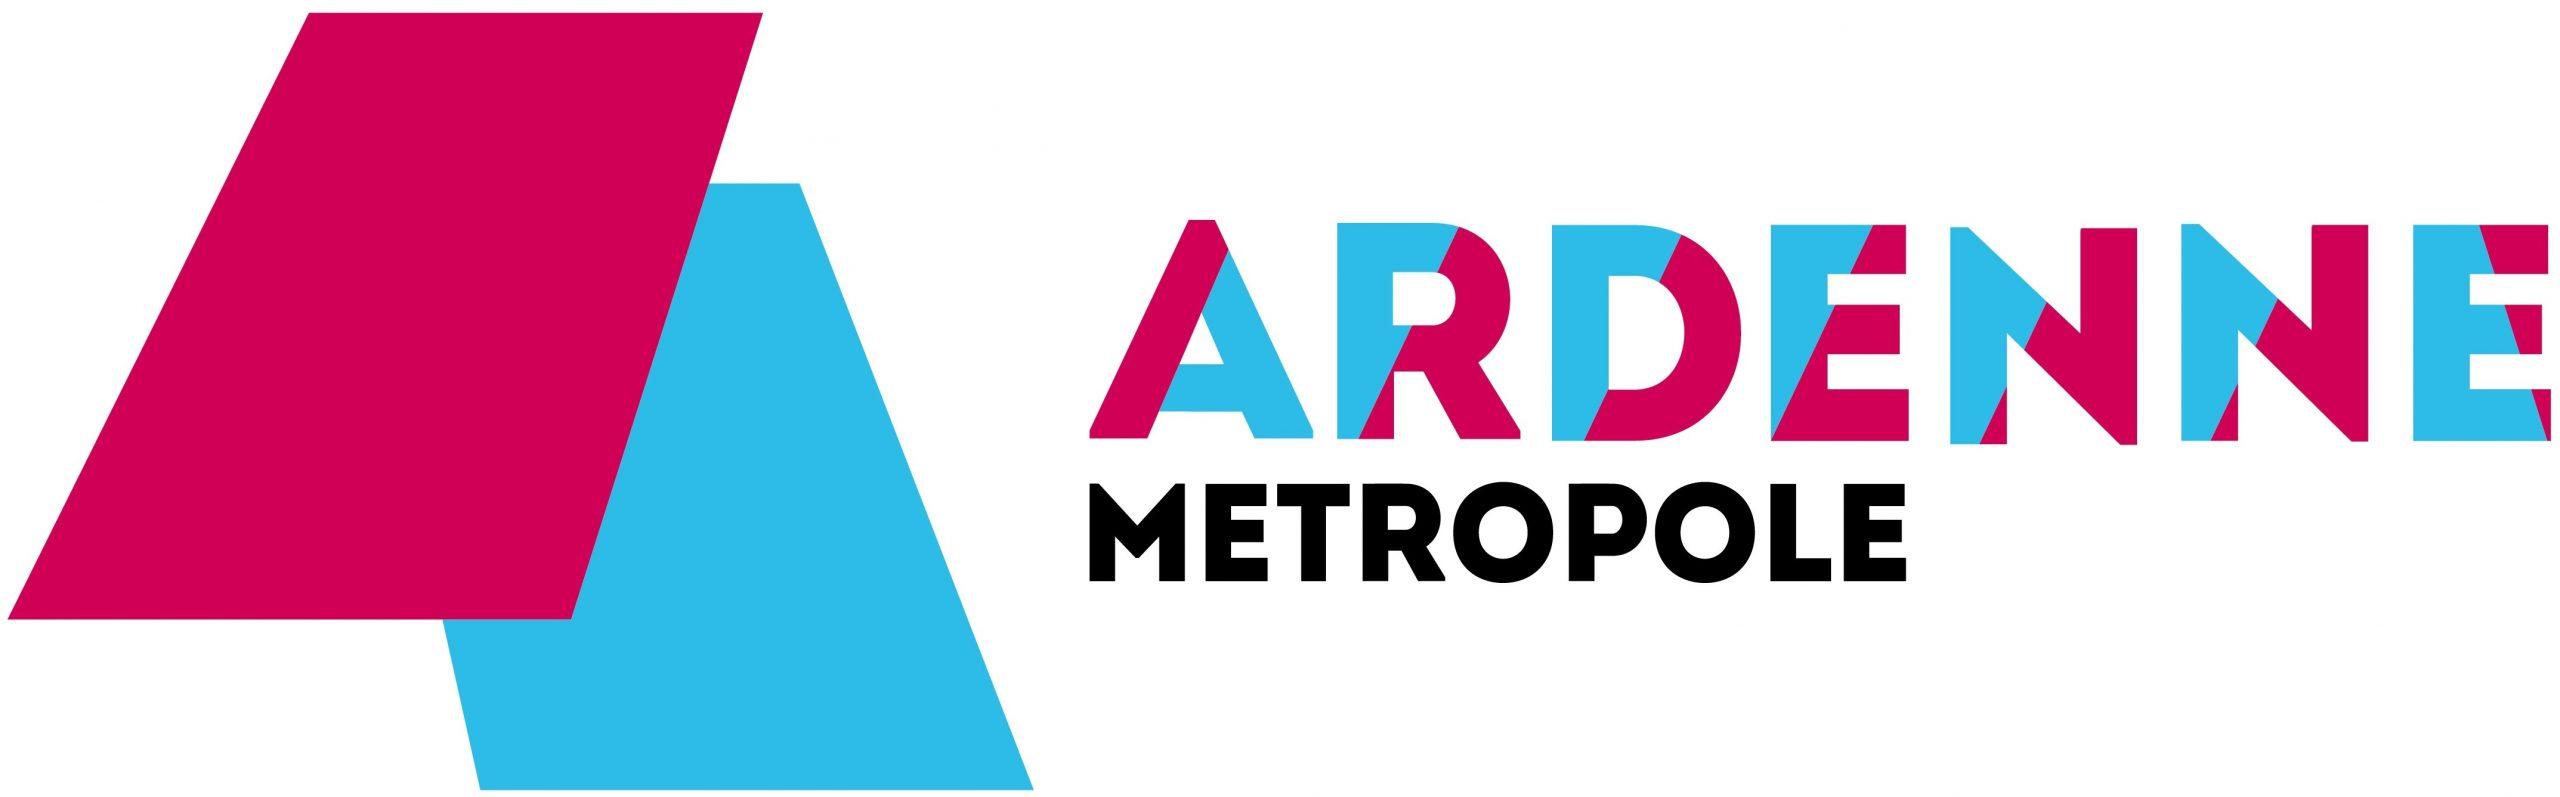 Ardenne-Metropole-RVB-scaled.jpg